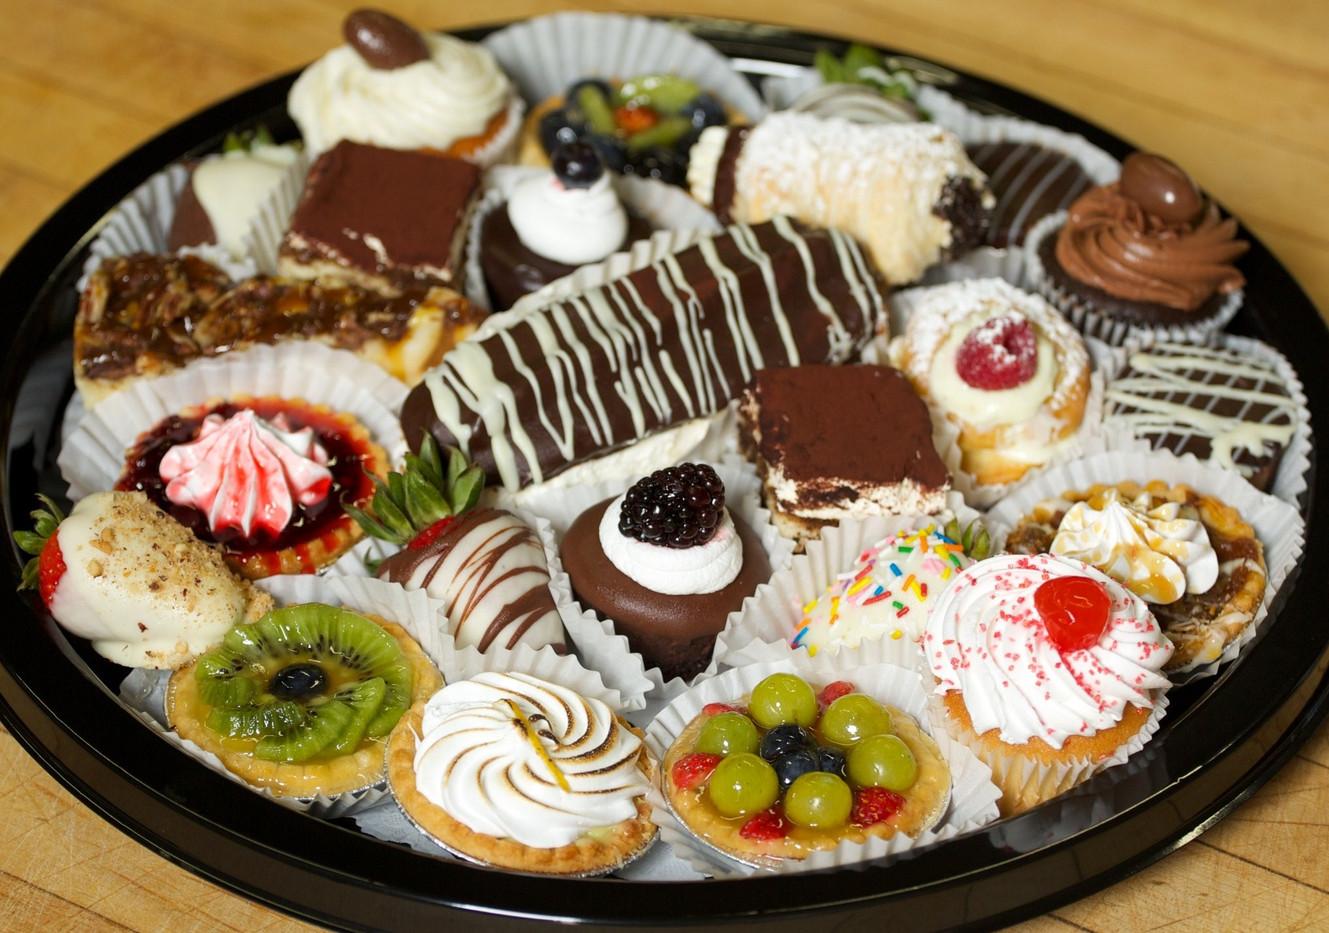 Petite Pastry Tray